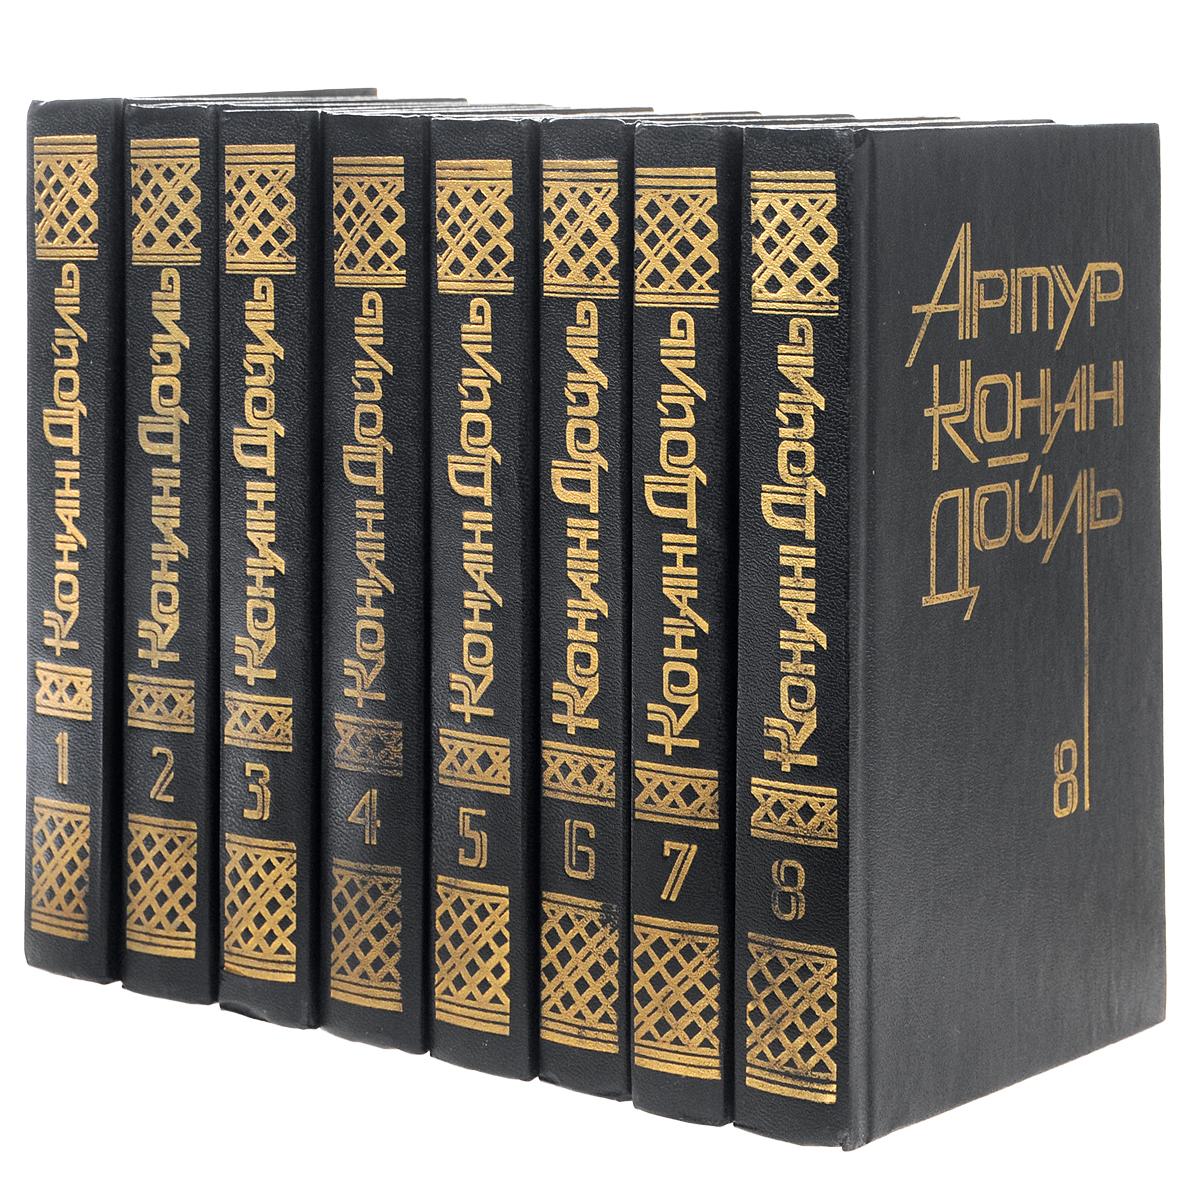 Артур Конан Дойль Артур Конан Дойль. Собрание сочинений в 8 томах (комплект из 8 книг) блейк пирс le mensonge d'un voisin page 4 page 5